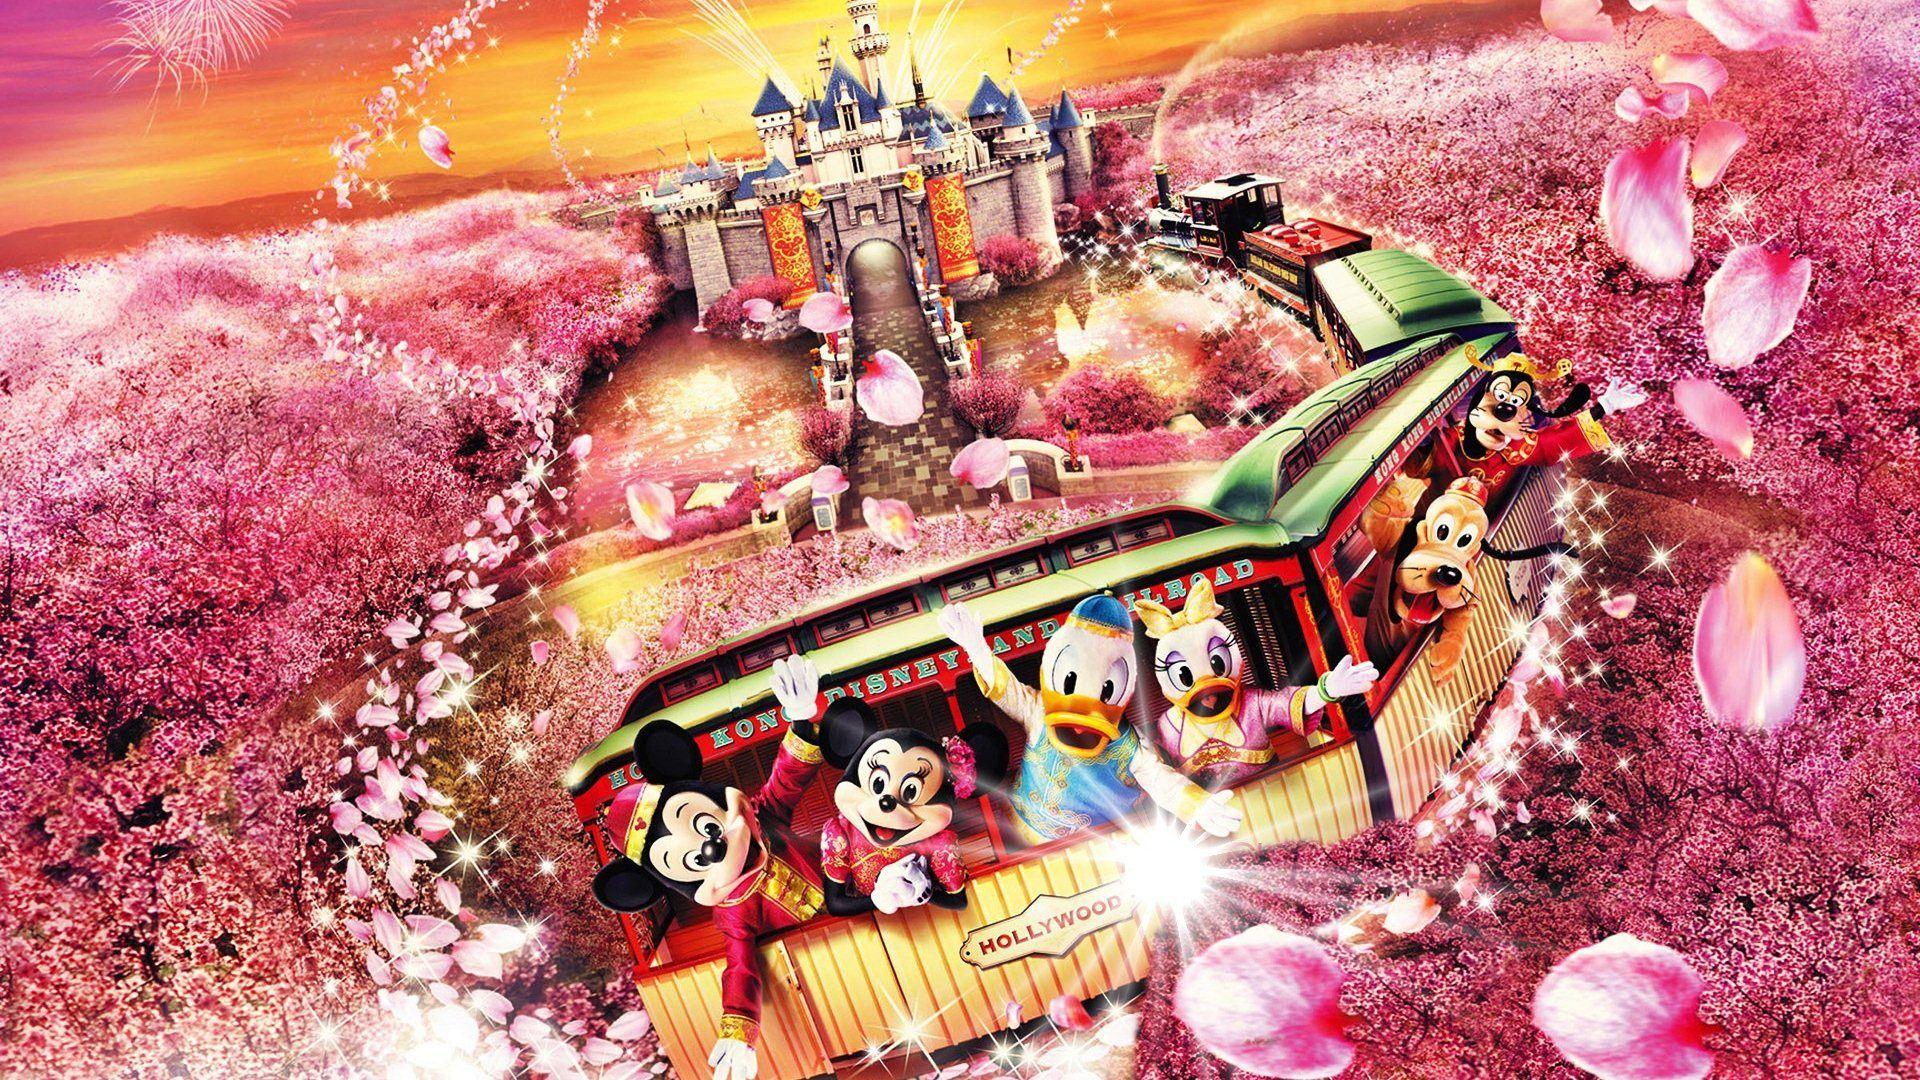 Disney Christmas hd wallpaper download